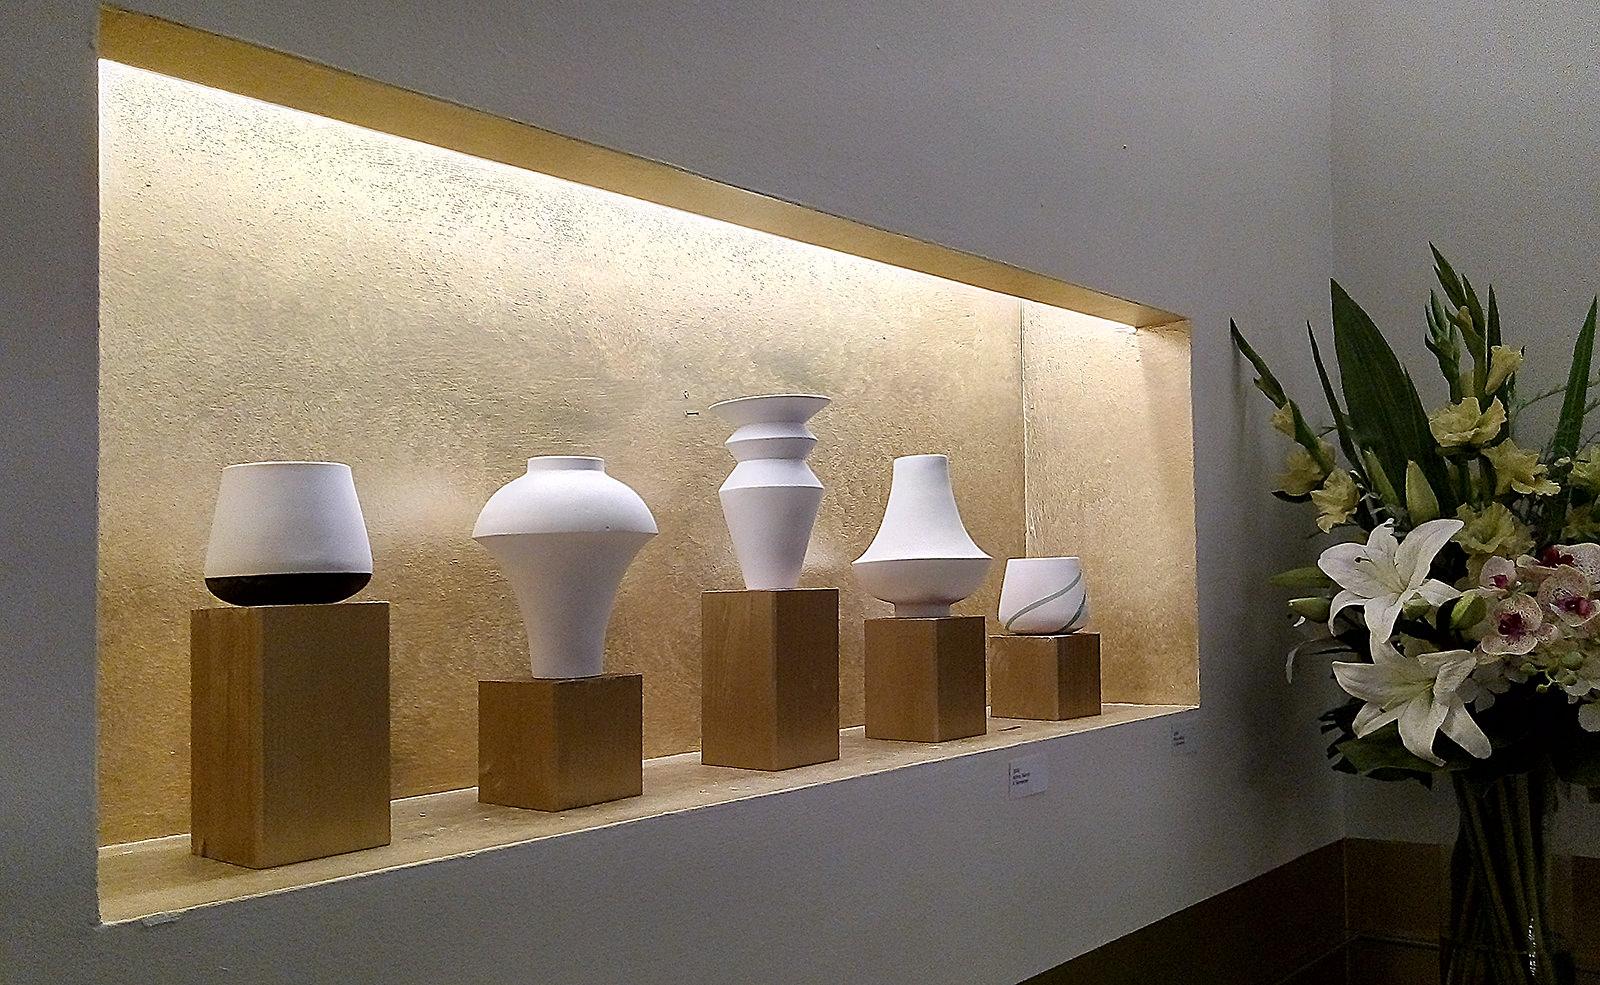 Keramikausstellung Hotel Rathaus Juni 2020, Artina Tabrizi